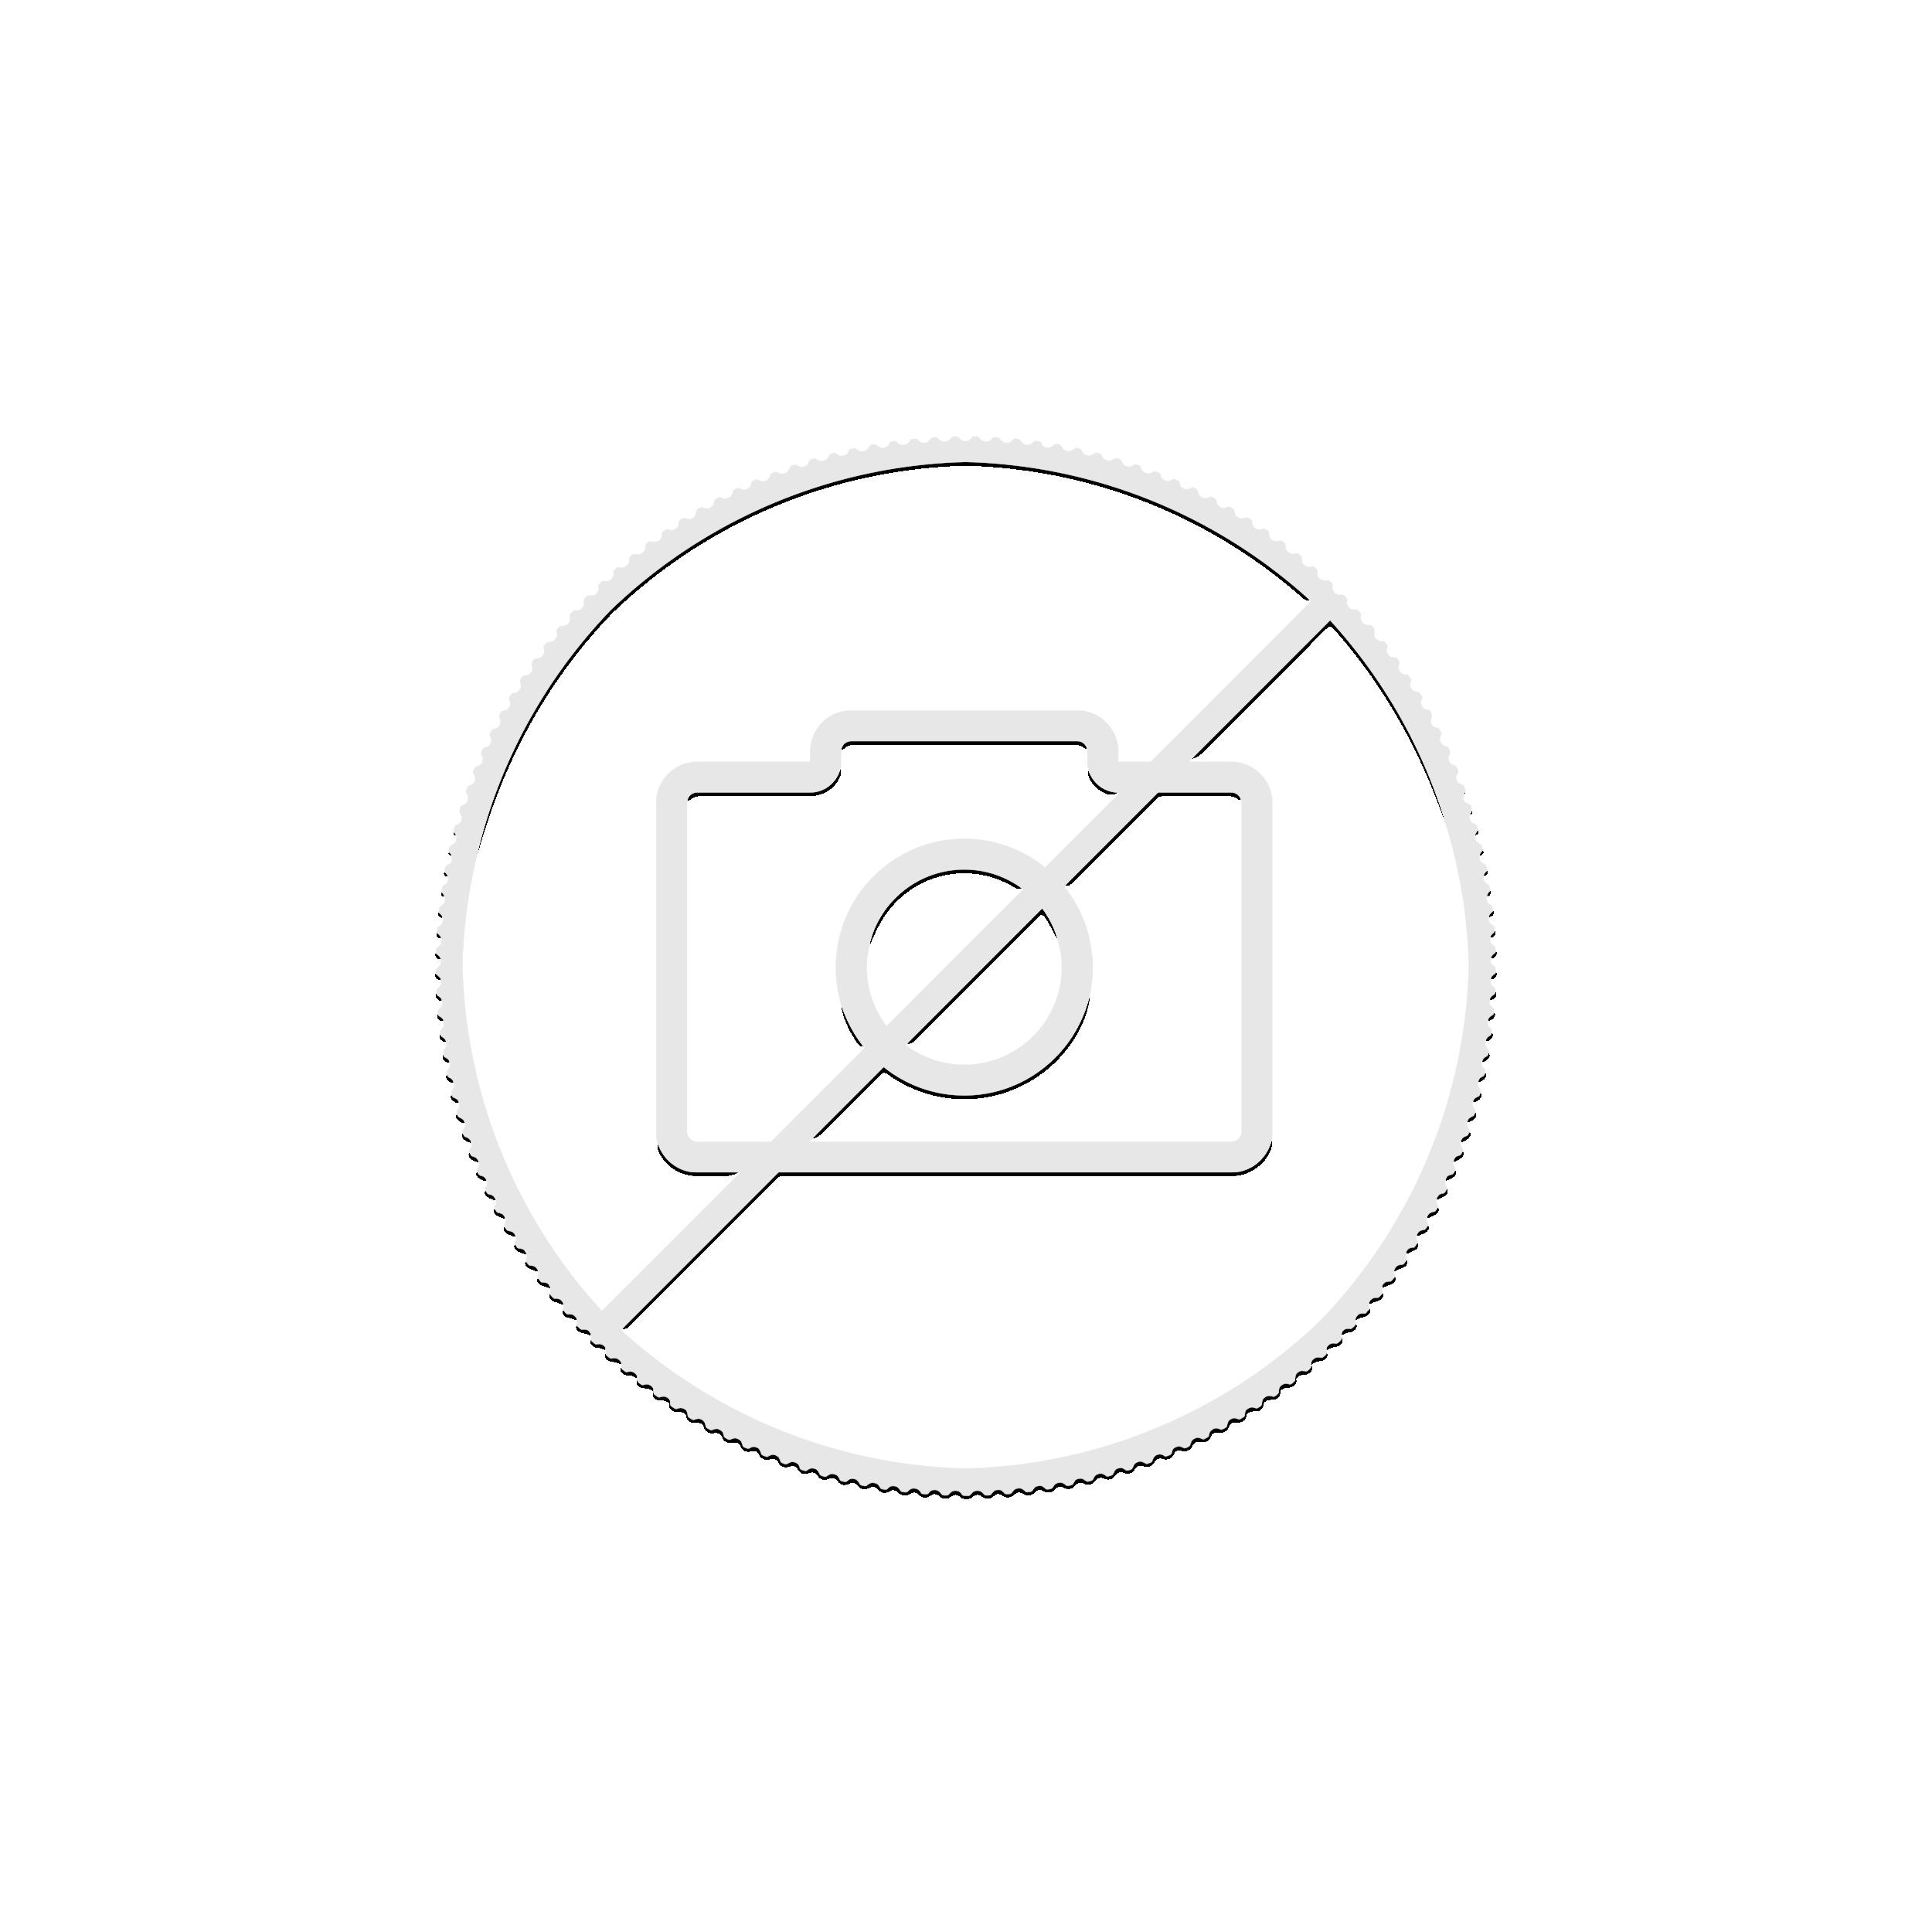 15 Gram gold coin Panda 2021